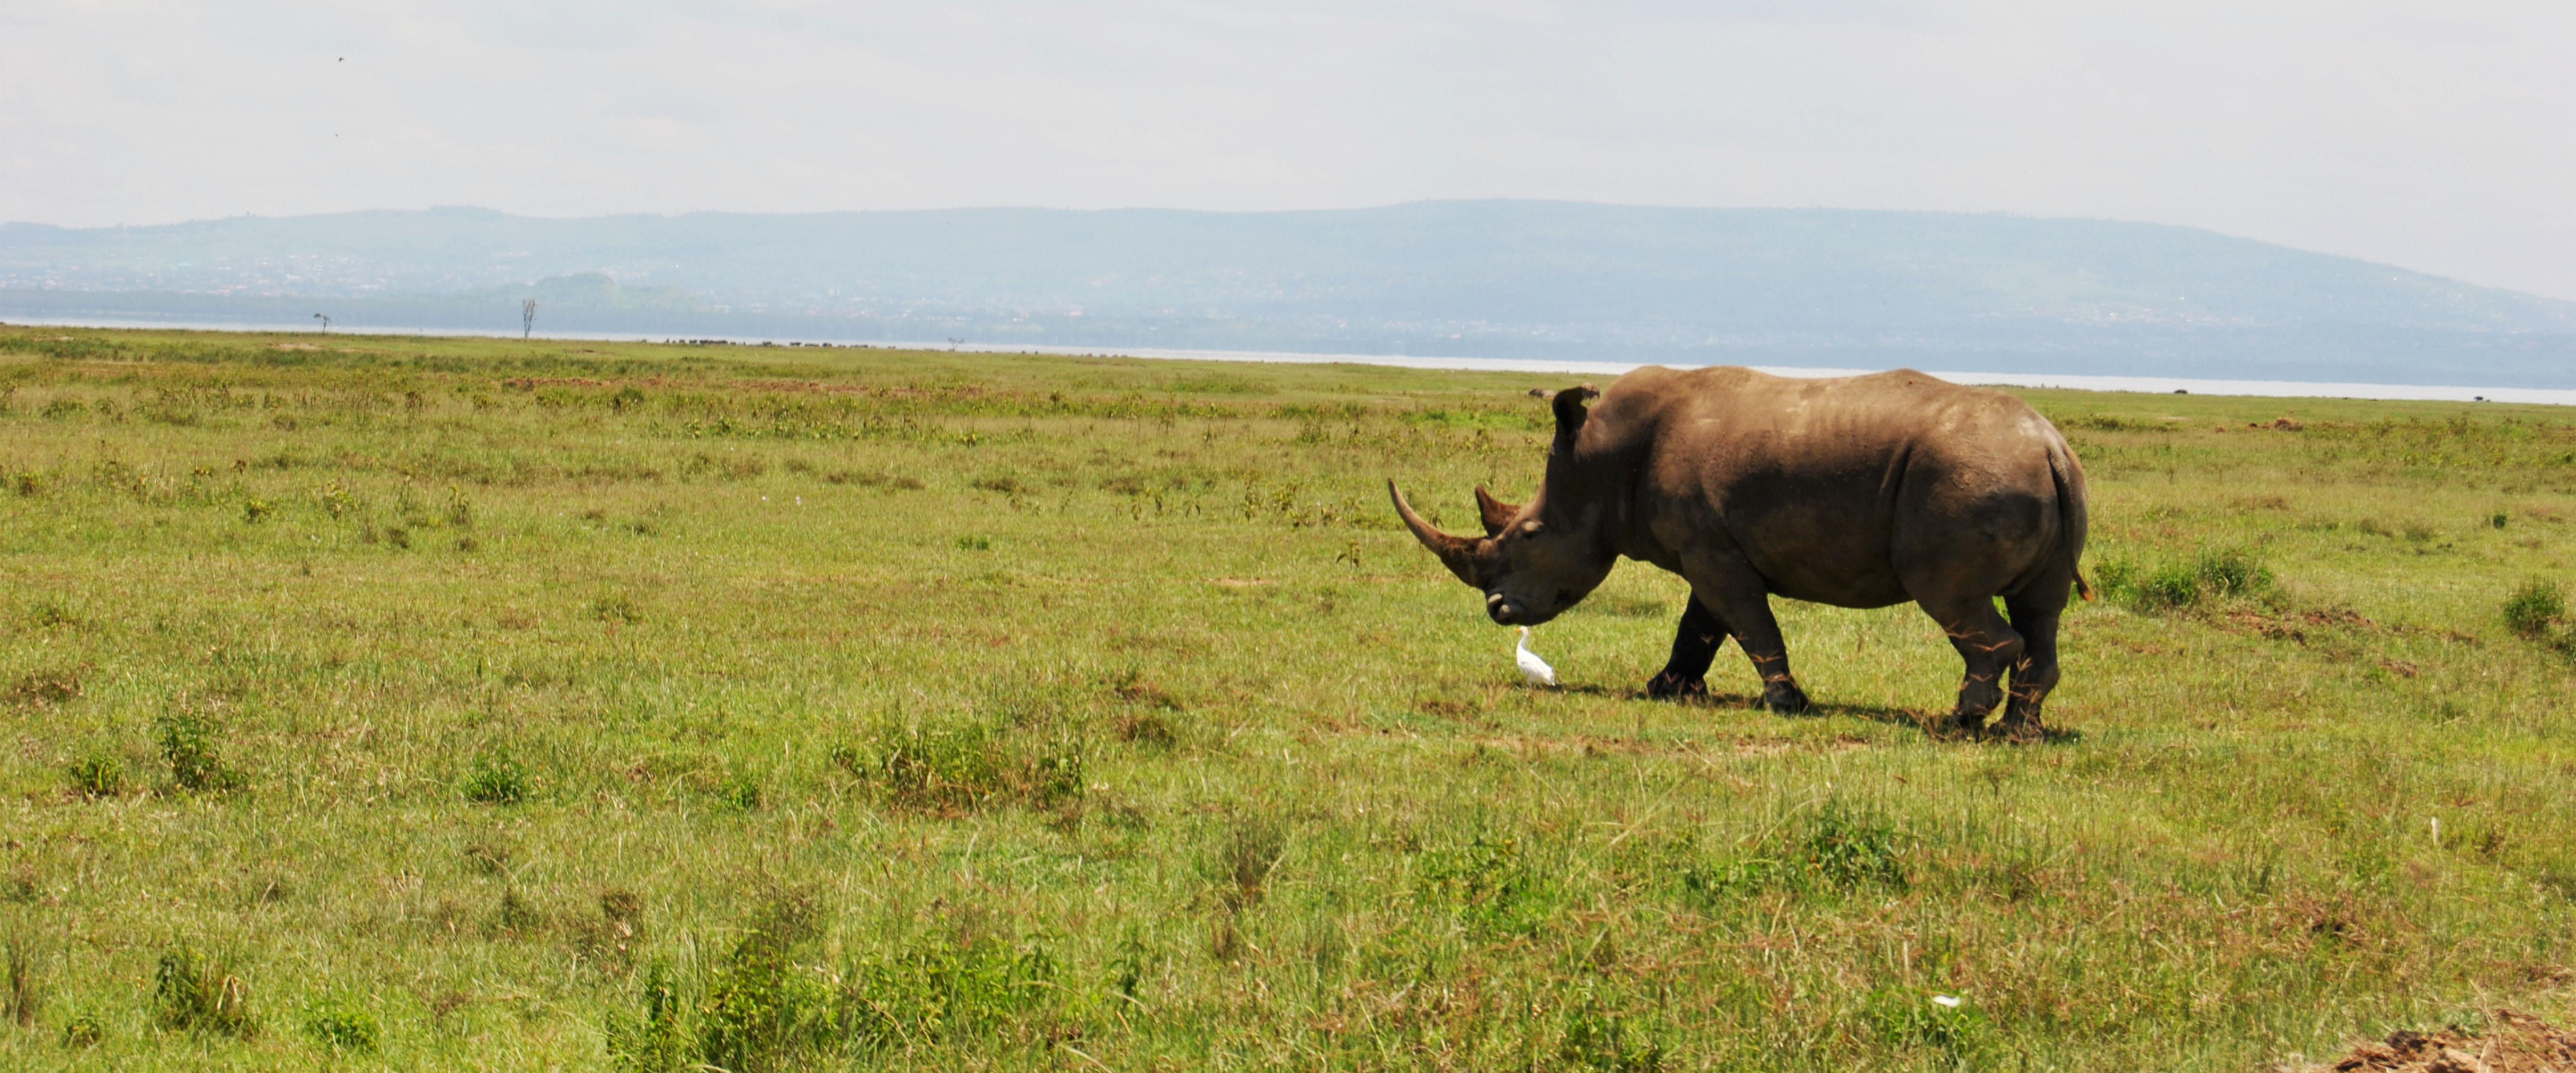 Nakuru rinoceronte savana Kenya Mani Tese 2017